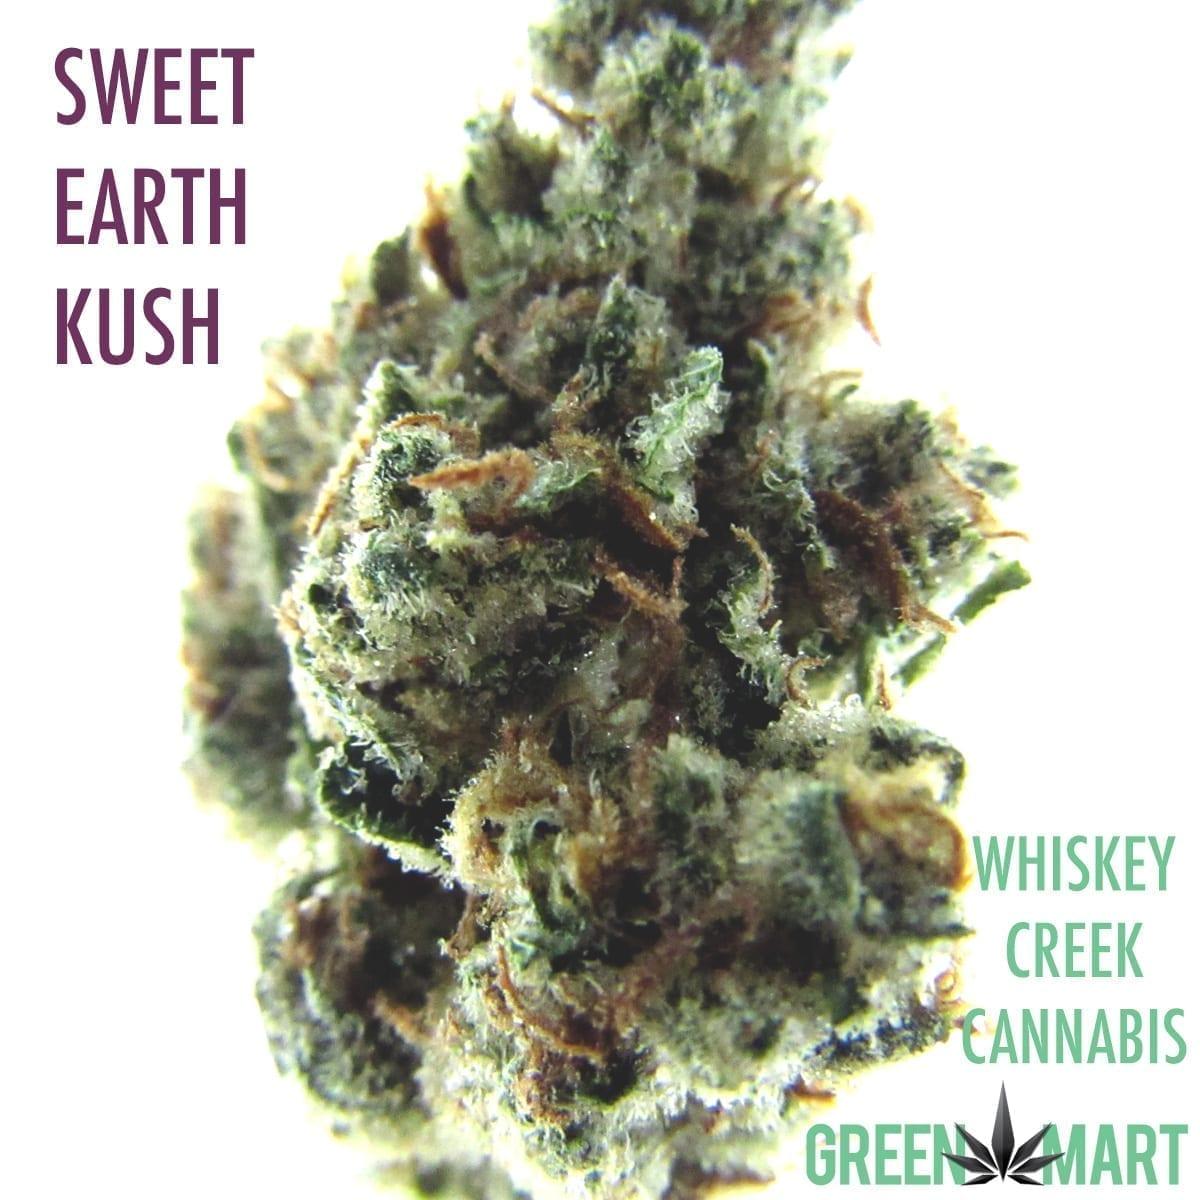 Sweet Earth Kush by Whiskey Creek Cannabis